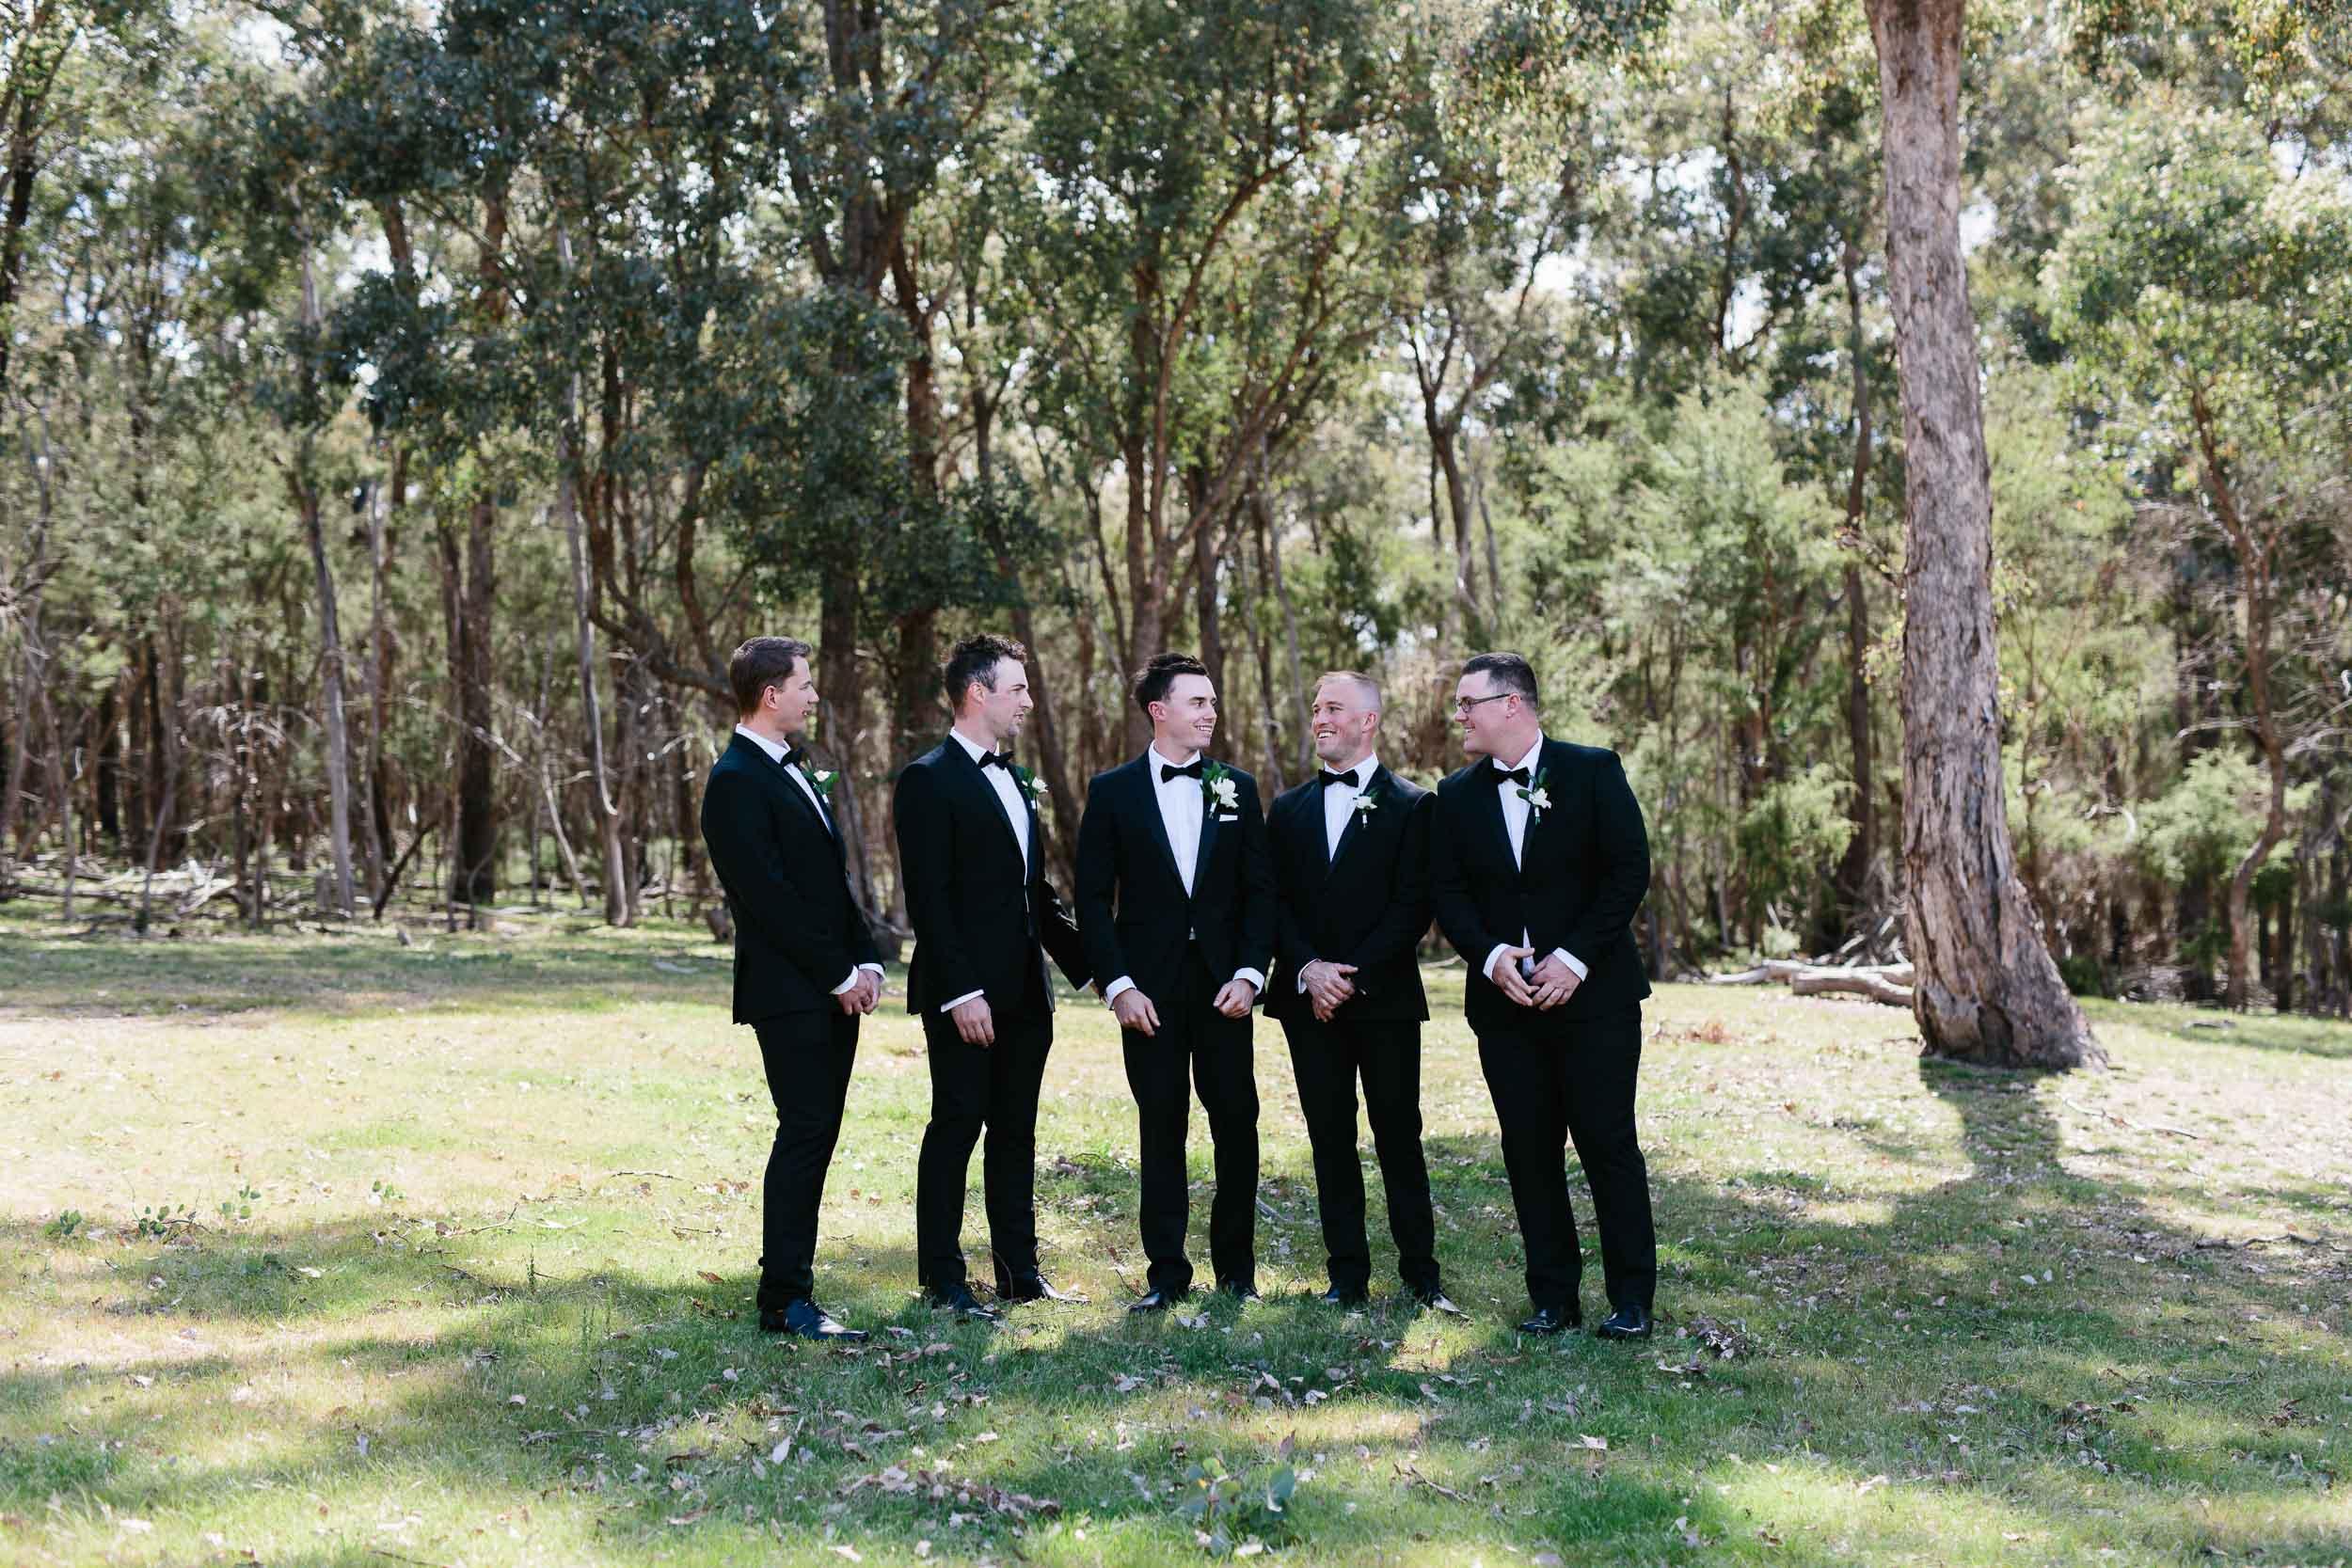 Kas-Richards-Stones-of-the-Yarra-Valley-Wedding-70.jpg